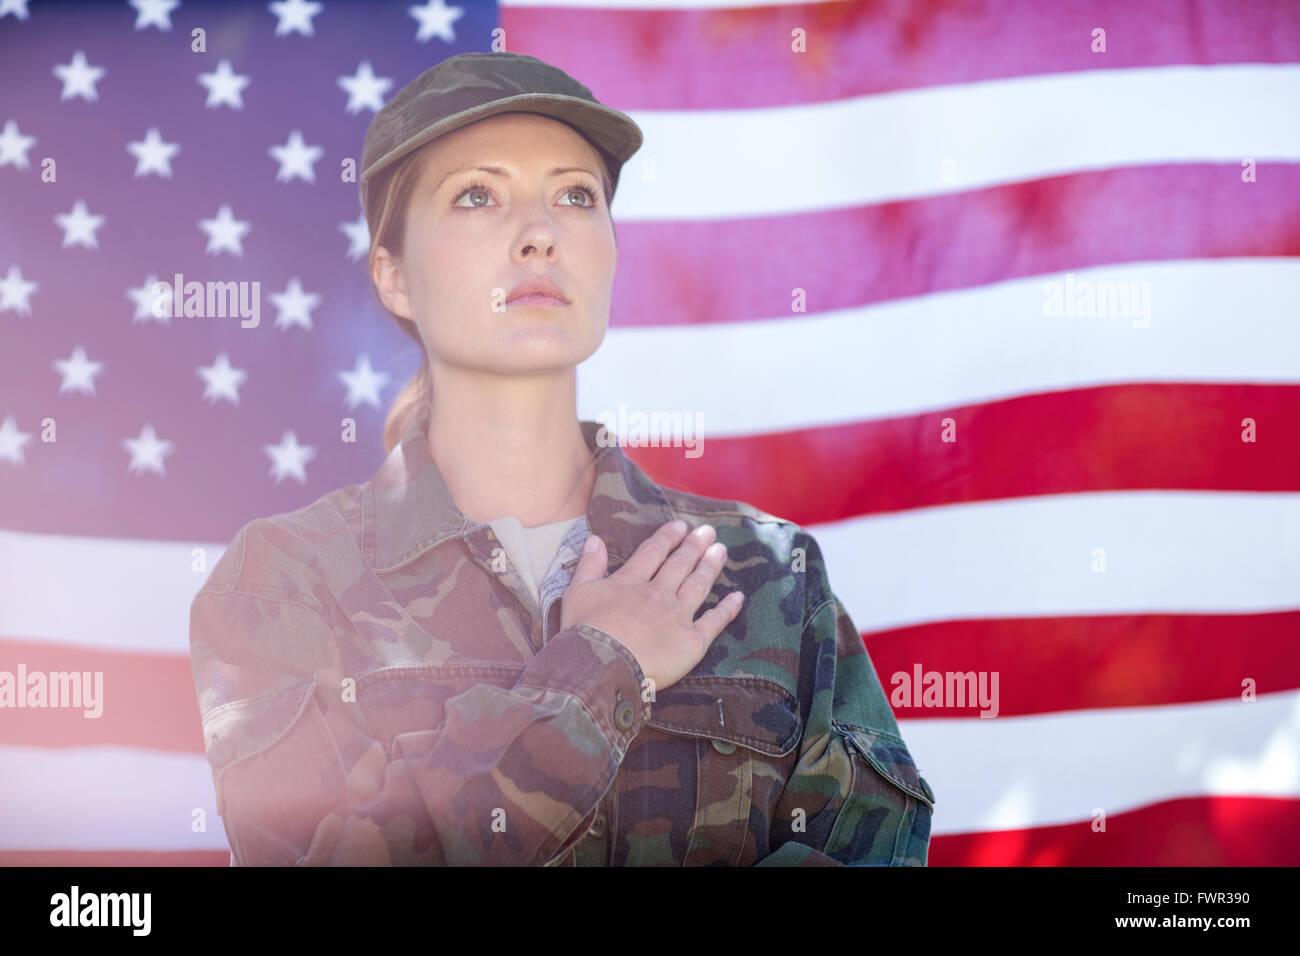 Soldier taking pledge - Stock Image